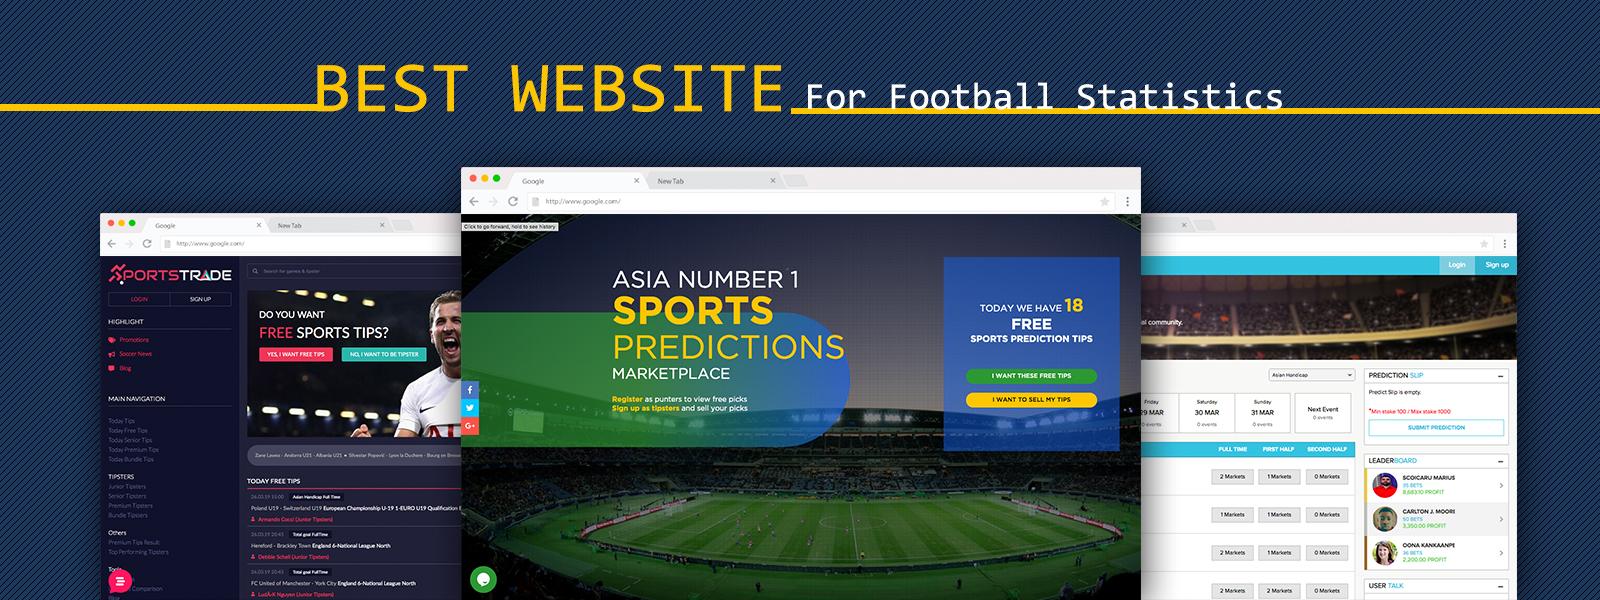 Best Website For Football Statistics